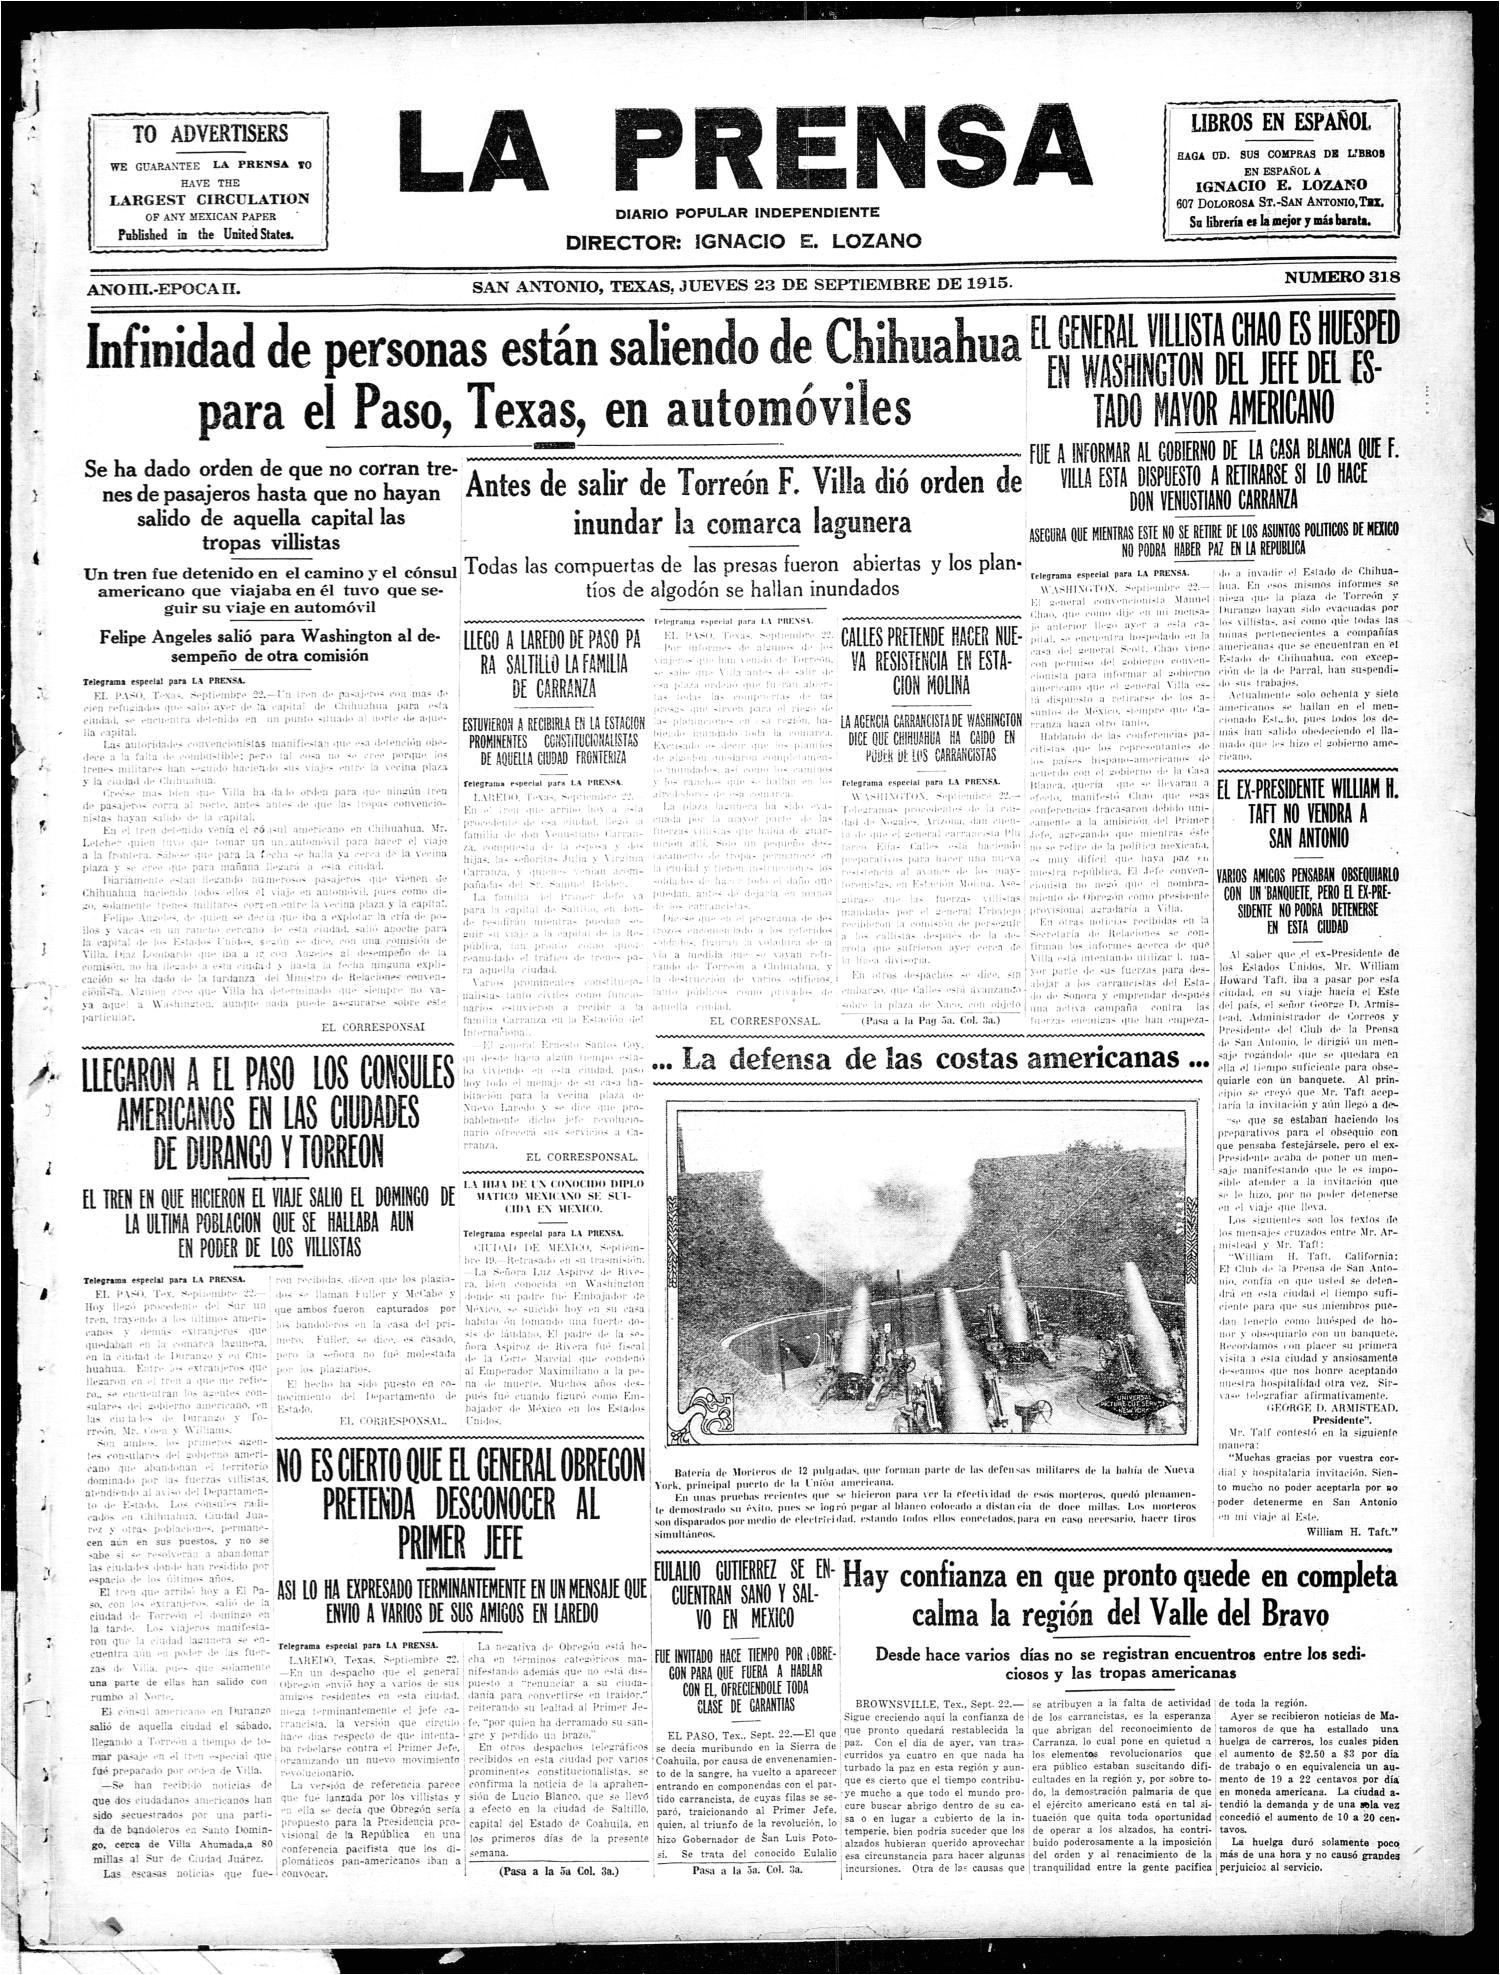 la prensa san antonio tex vol 3 no 318 ed 1 thursday september 23 1915 the portal to texas history